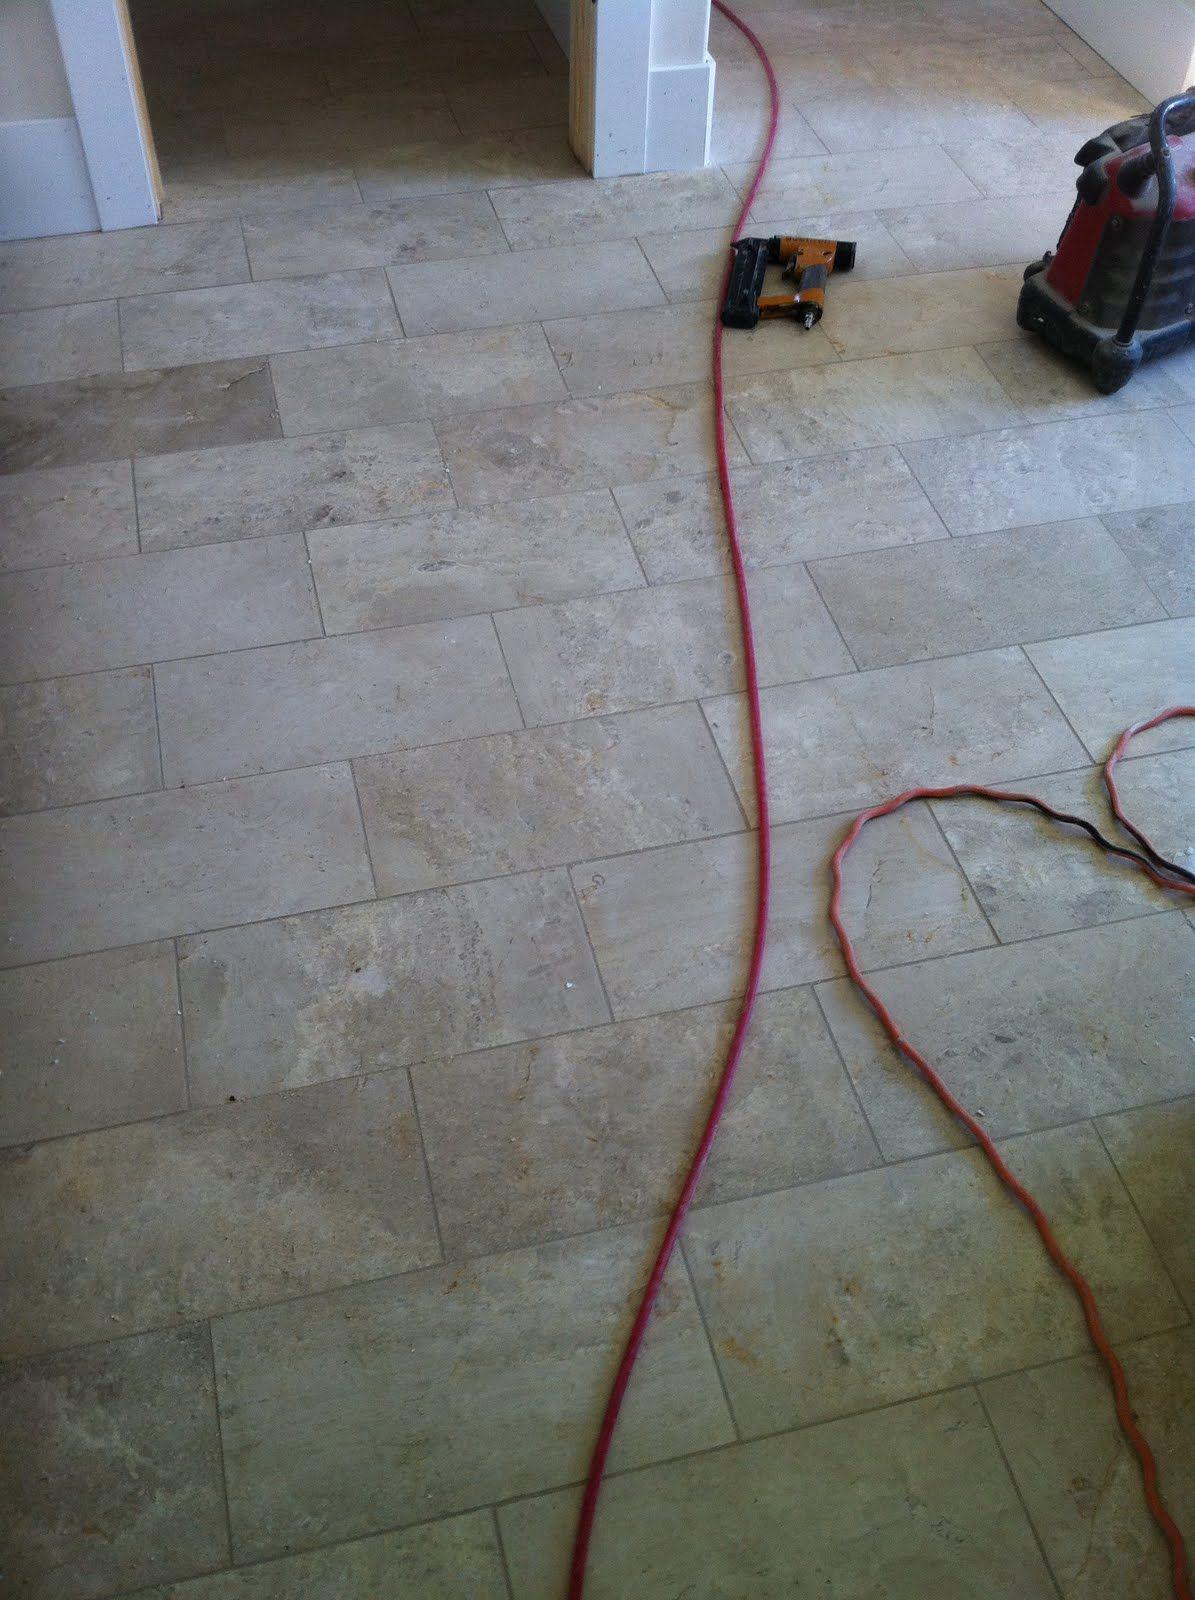 Cute 1 X 1 Ceiling Tiles Huge 12X12 Floor Tile Flat 2X2 Ceiling Tiles 2X2 Ceramic Floor Tile Young 3 X 6 White Subway Tile White3X6 Ceramic Tile 12 Inch Tile Cut In Half To Create Brick Look | 2015 Kitchen ..